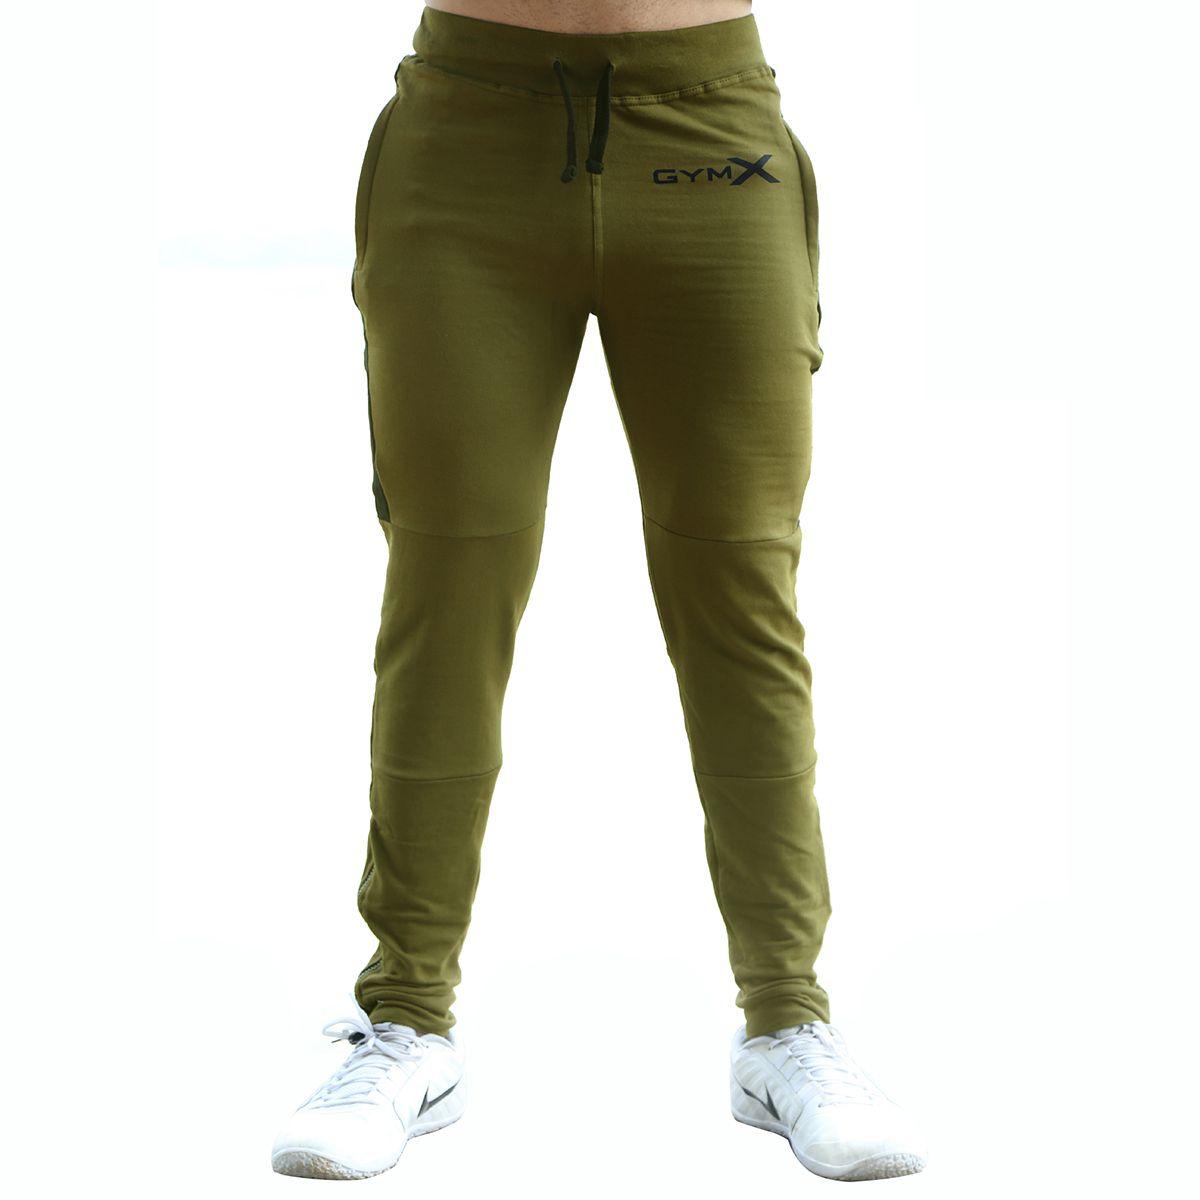 GymX Mens Outperform Military Green Sweatpants (Flex Fit)